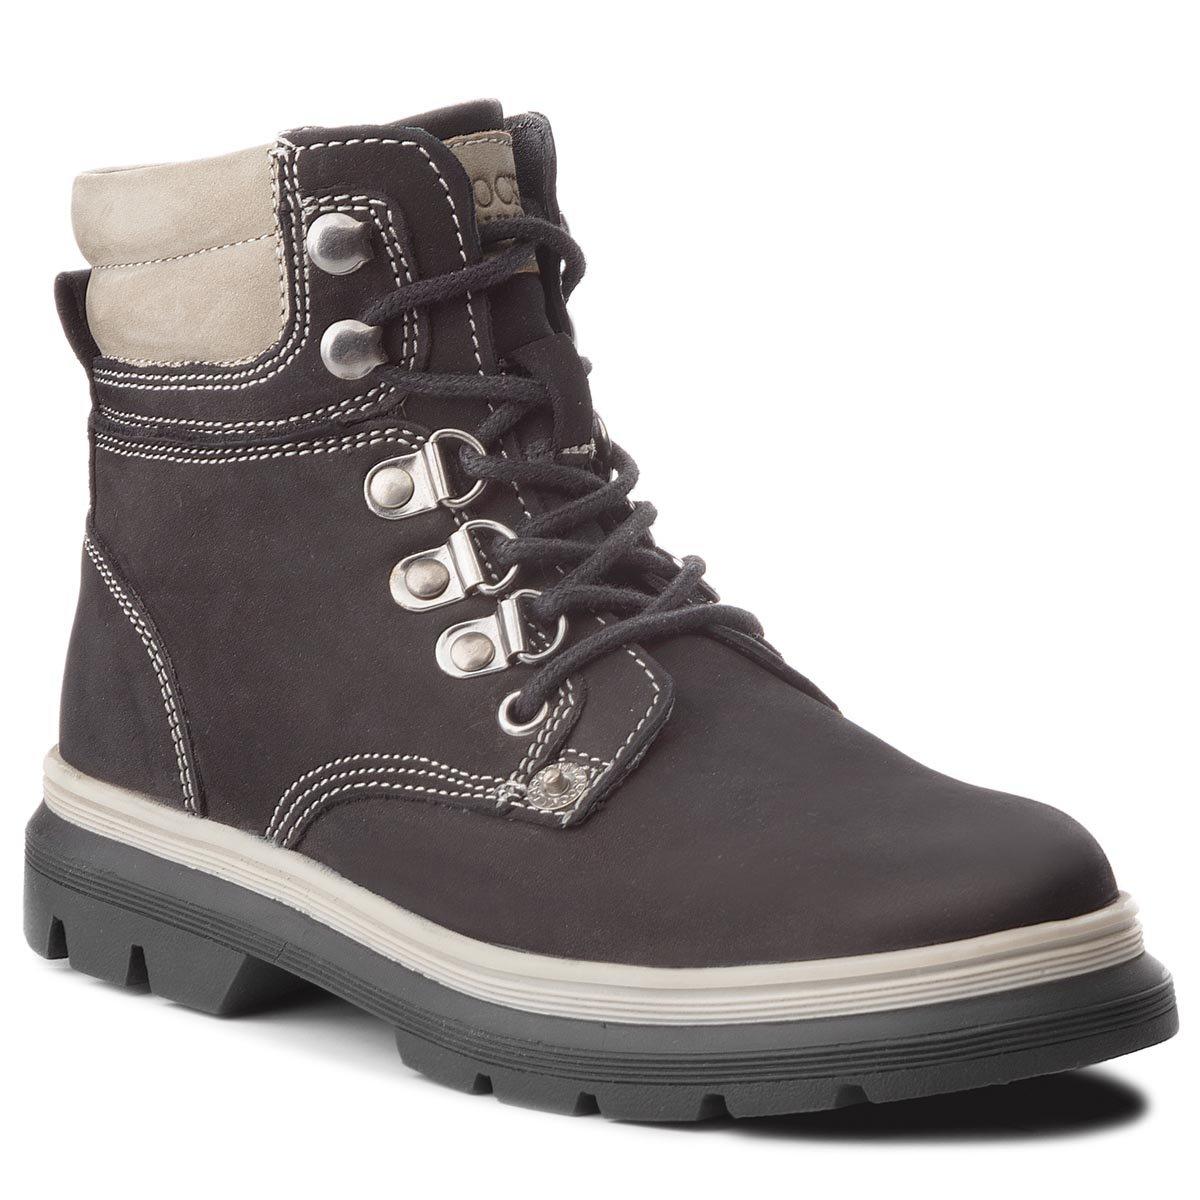 c857d37f19b45 vysoká šnurovacia topánka Lasocki Young CI12-HUMMER-04 čierna Detské -  Chlapčenské - https://ccc.eu